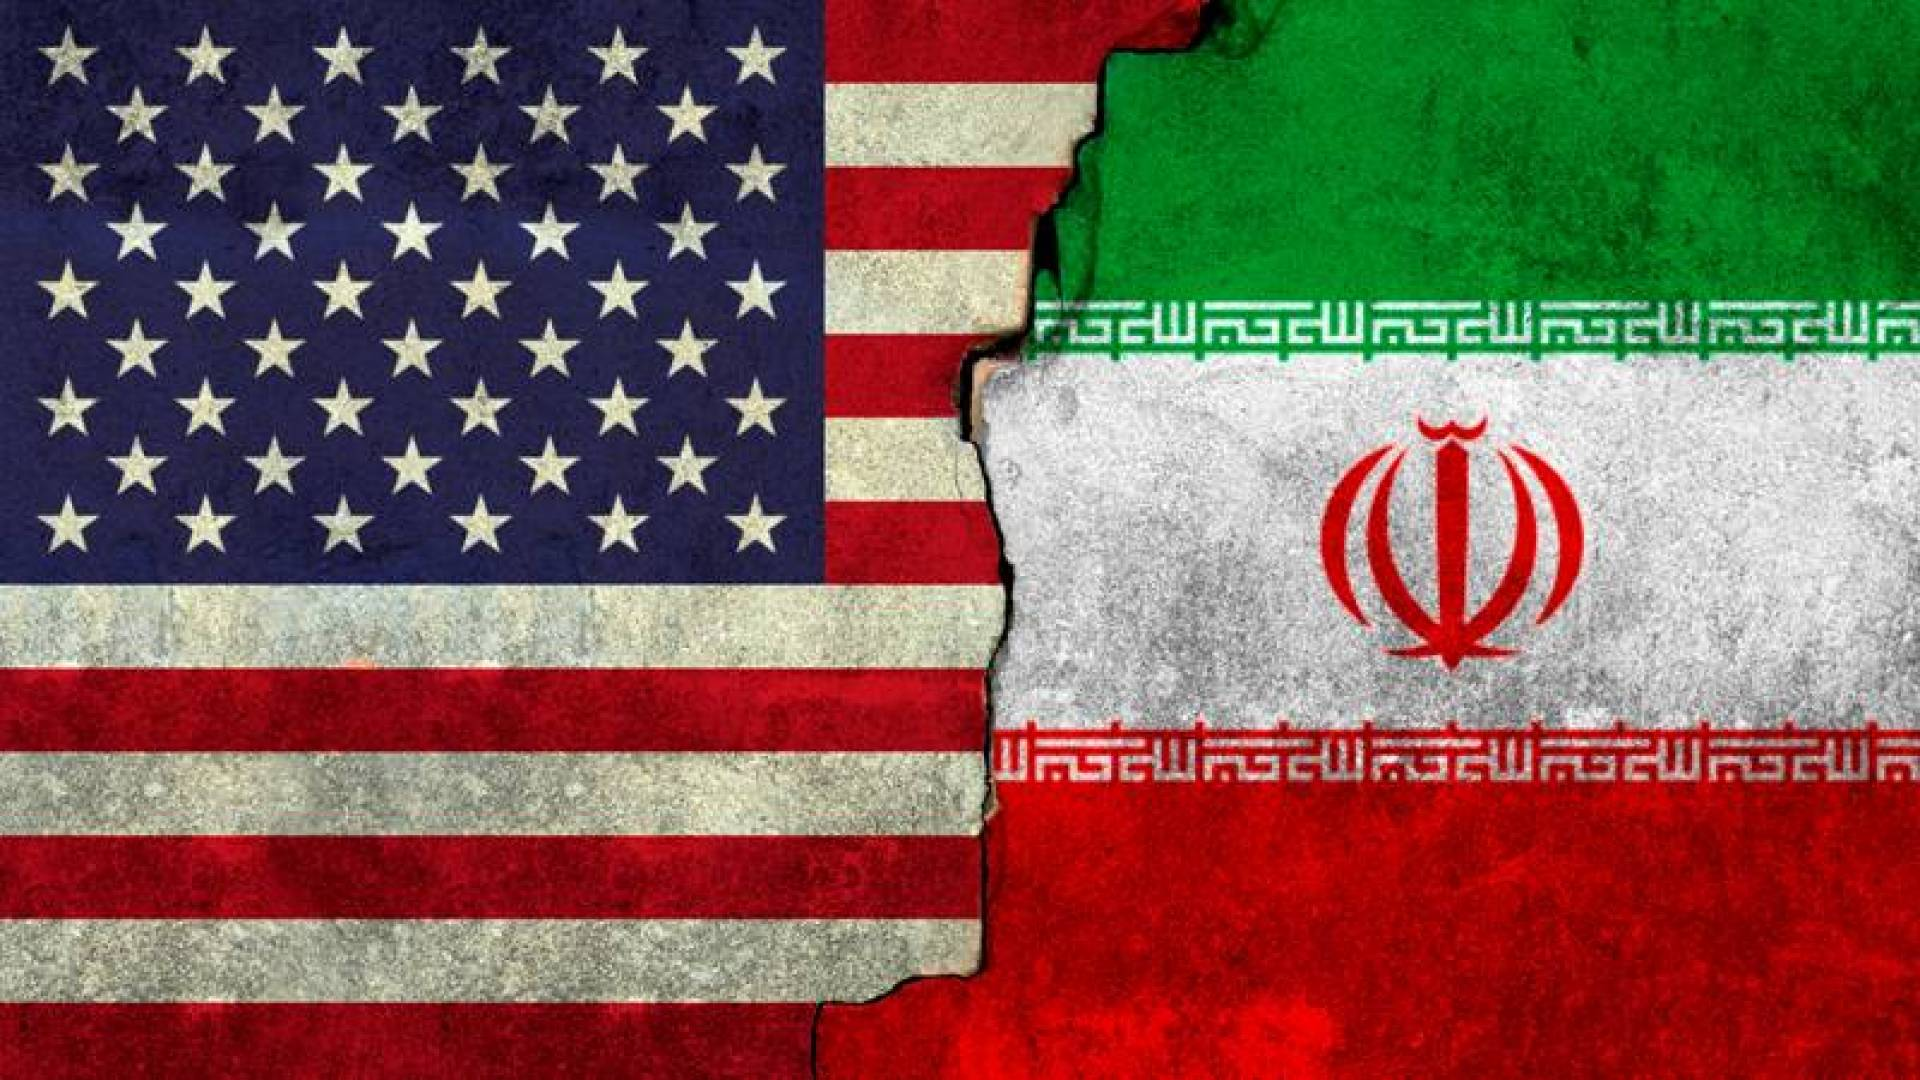 واشنطن وطهران تتبادلان التهديدات